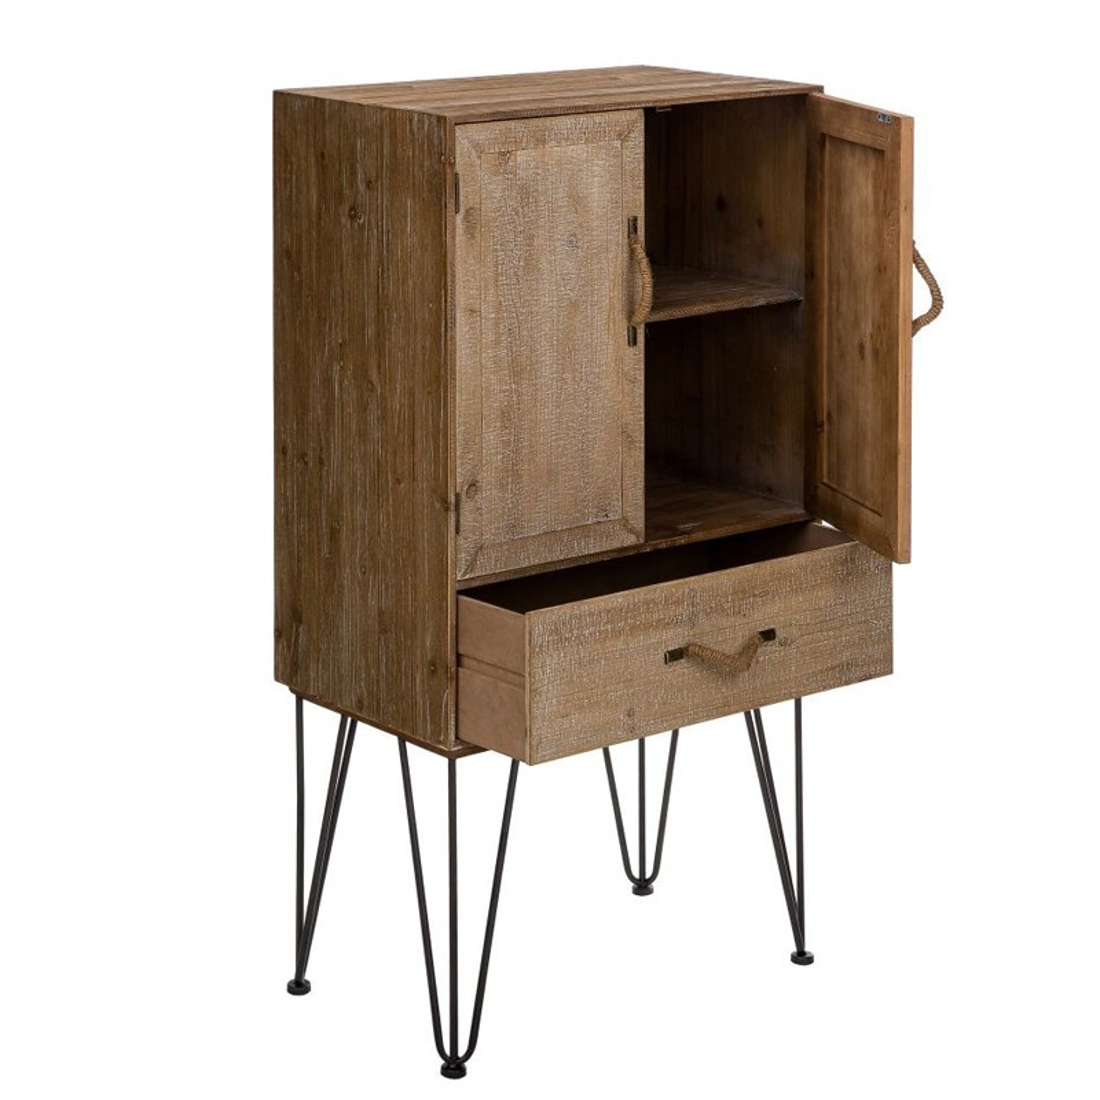 meuble d 39 entr e pi tement pingle brutus univers des petits meubles. Black Bedroom Furniture Sets. Home Design Ideas